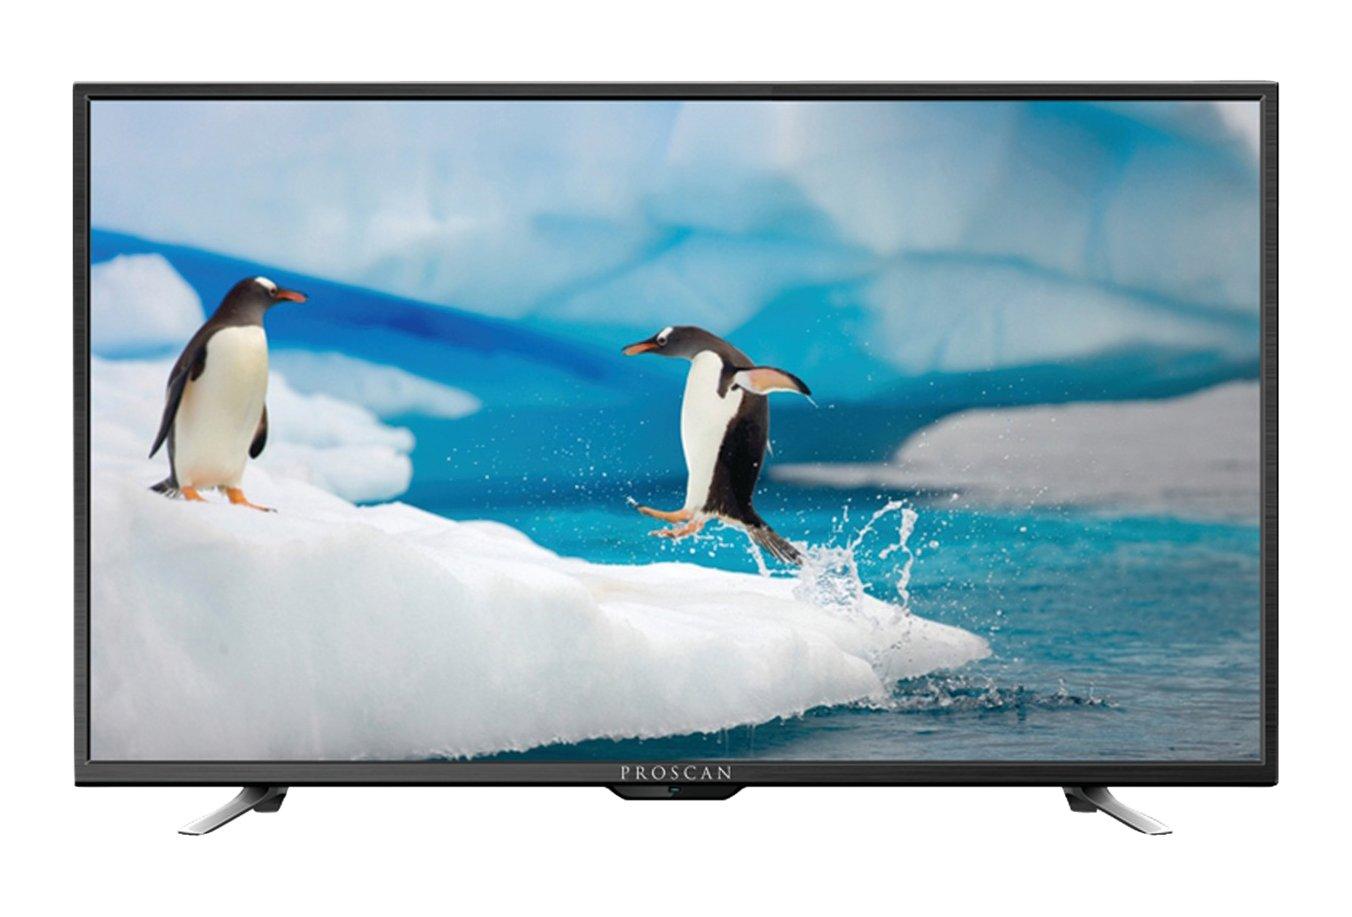 Amazon.com: Proscan PLDED5515-UHD 55-inch 4k TV: Electronics